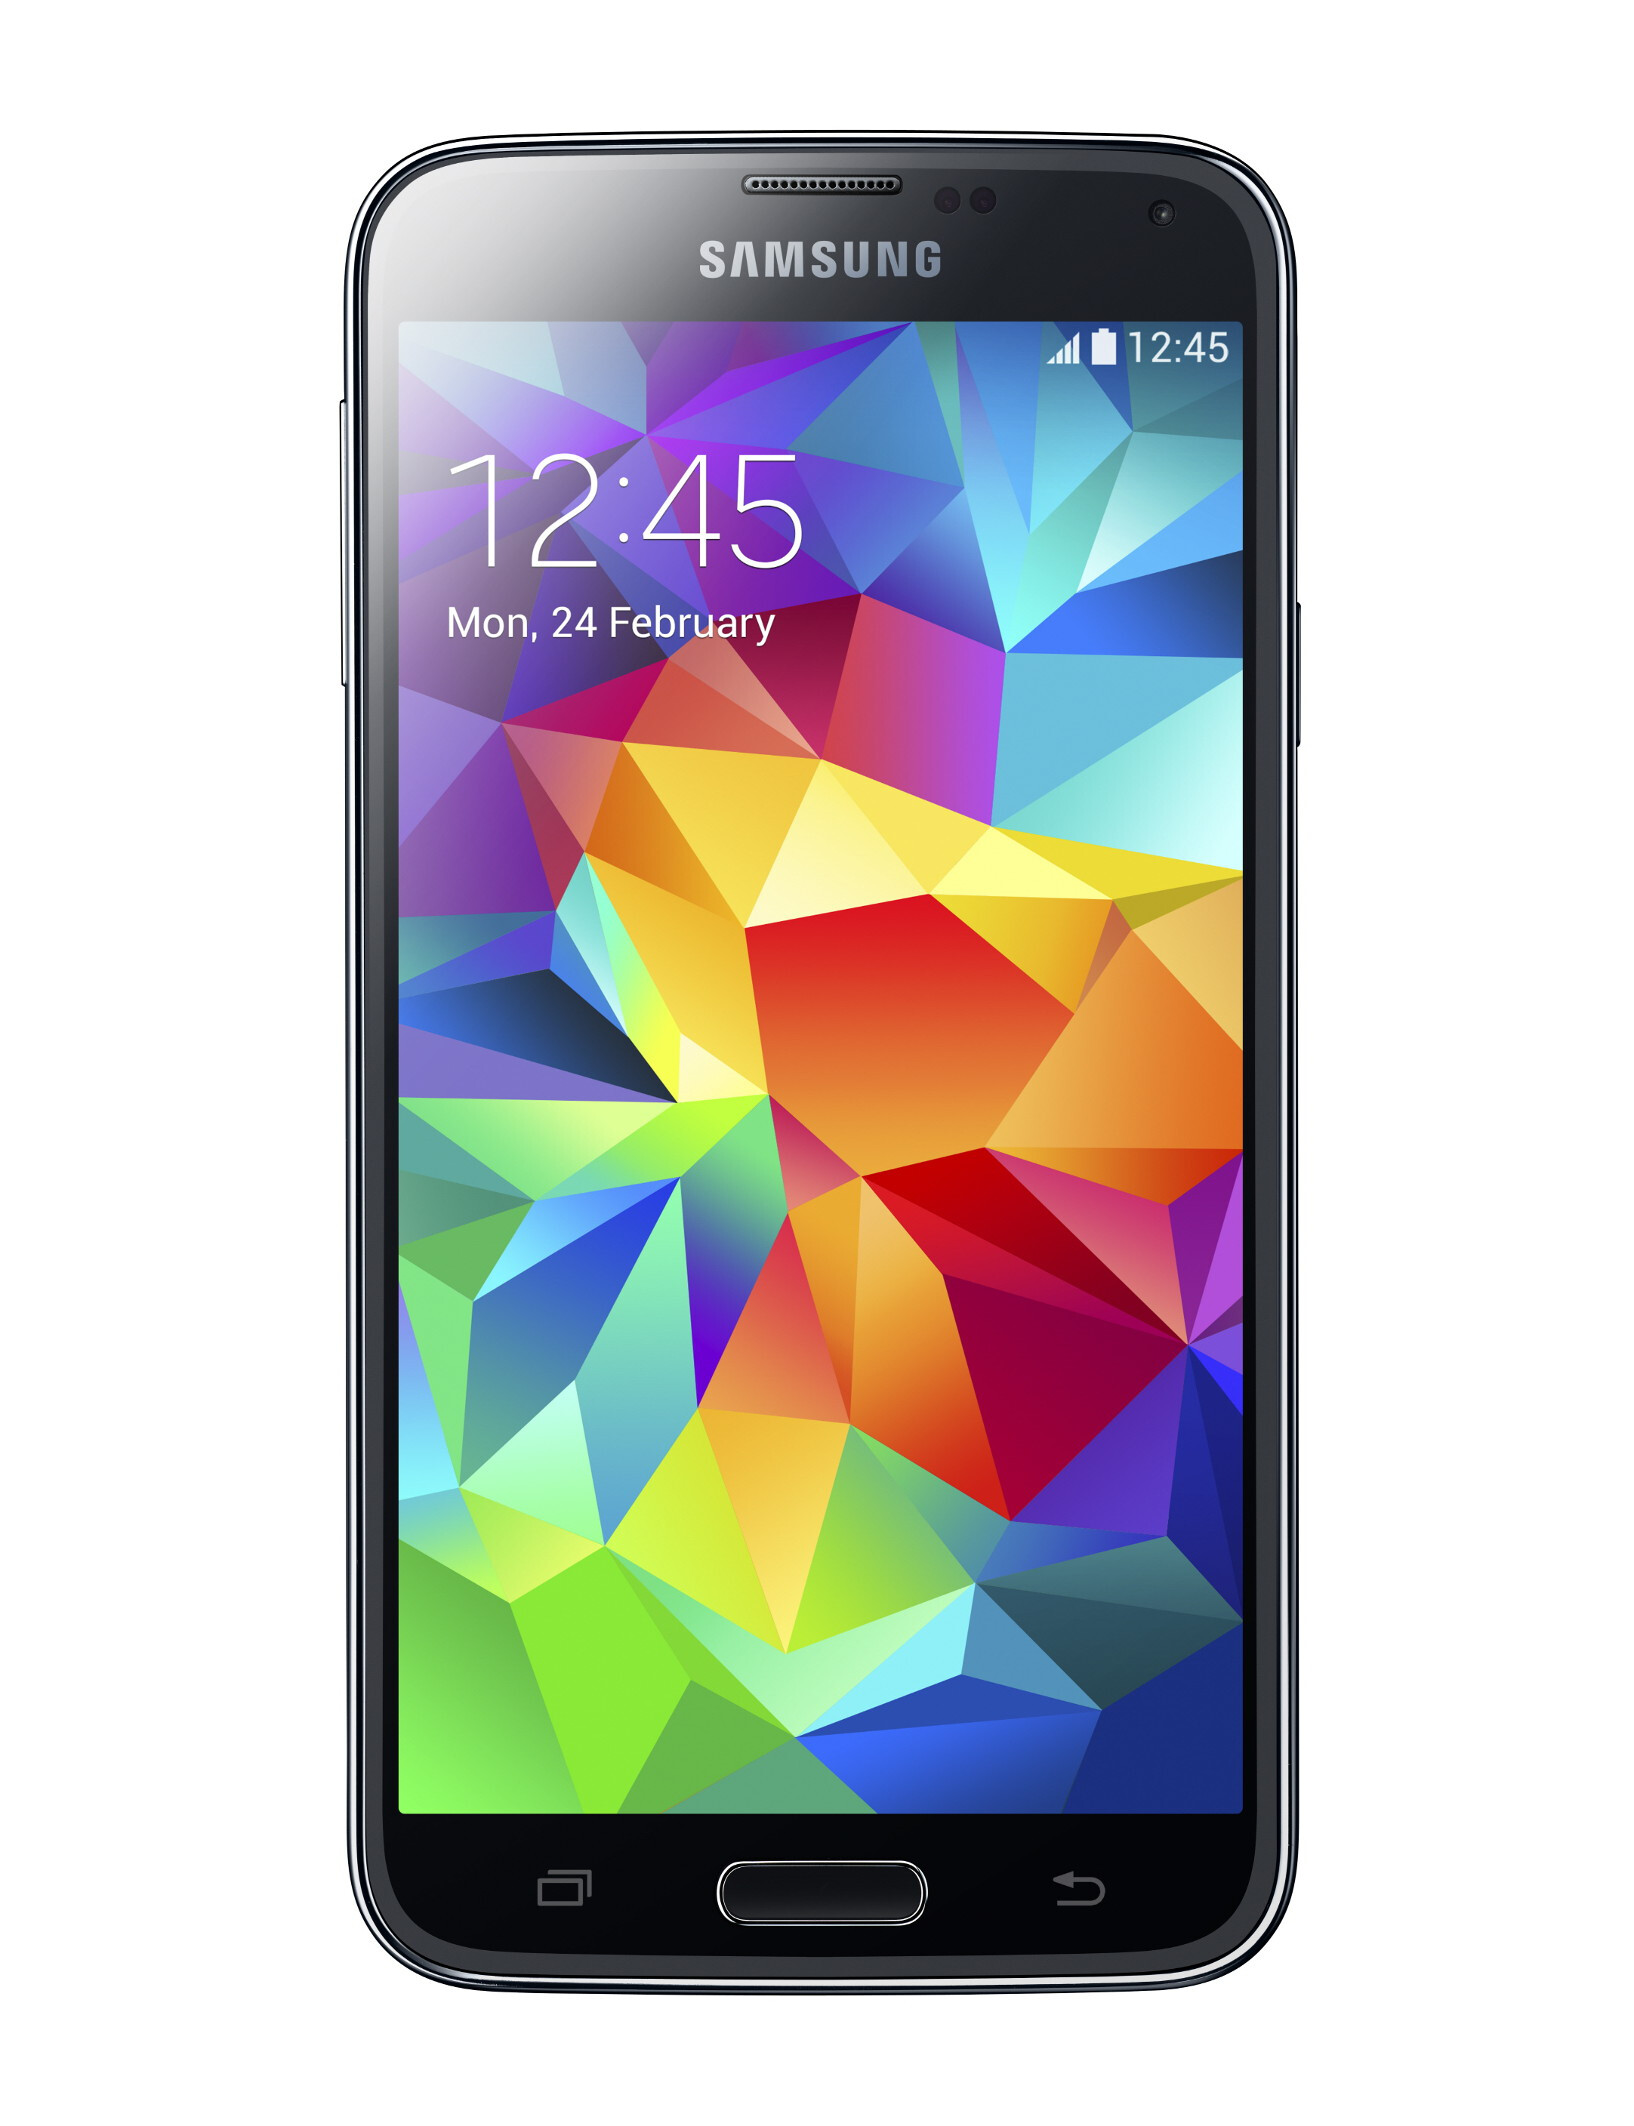 Samsung Galaxy S5 Plus Specs